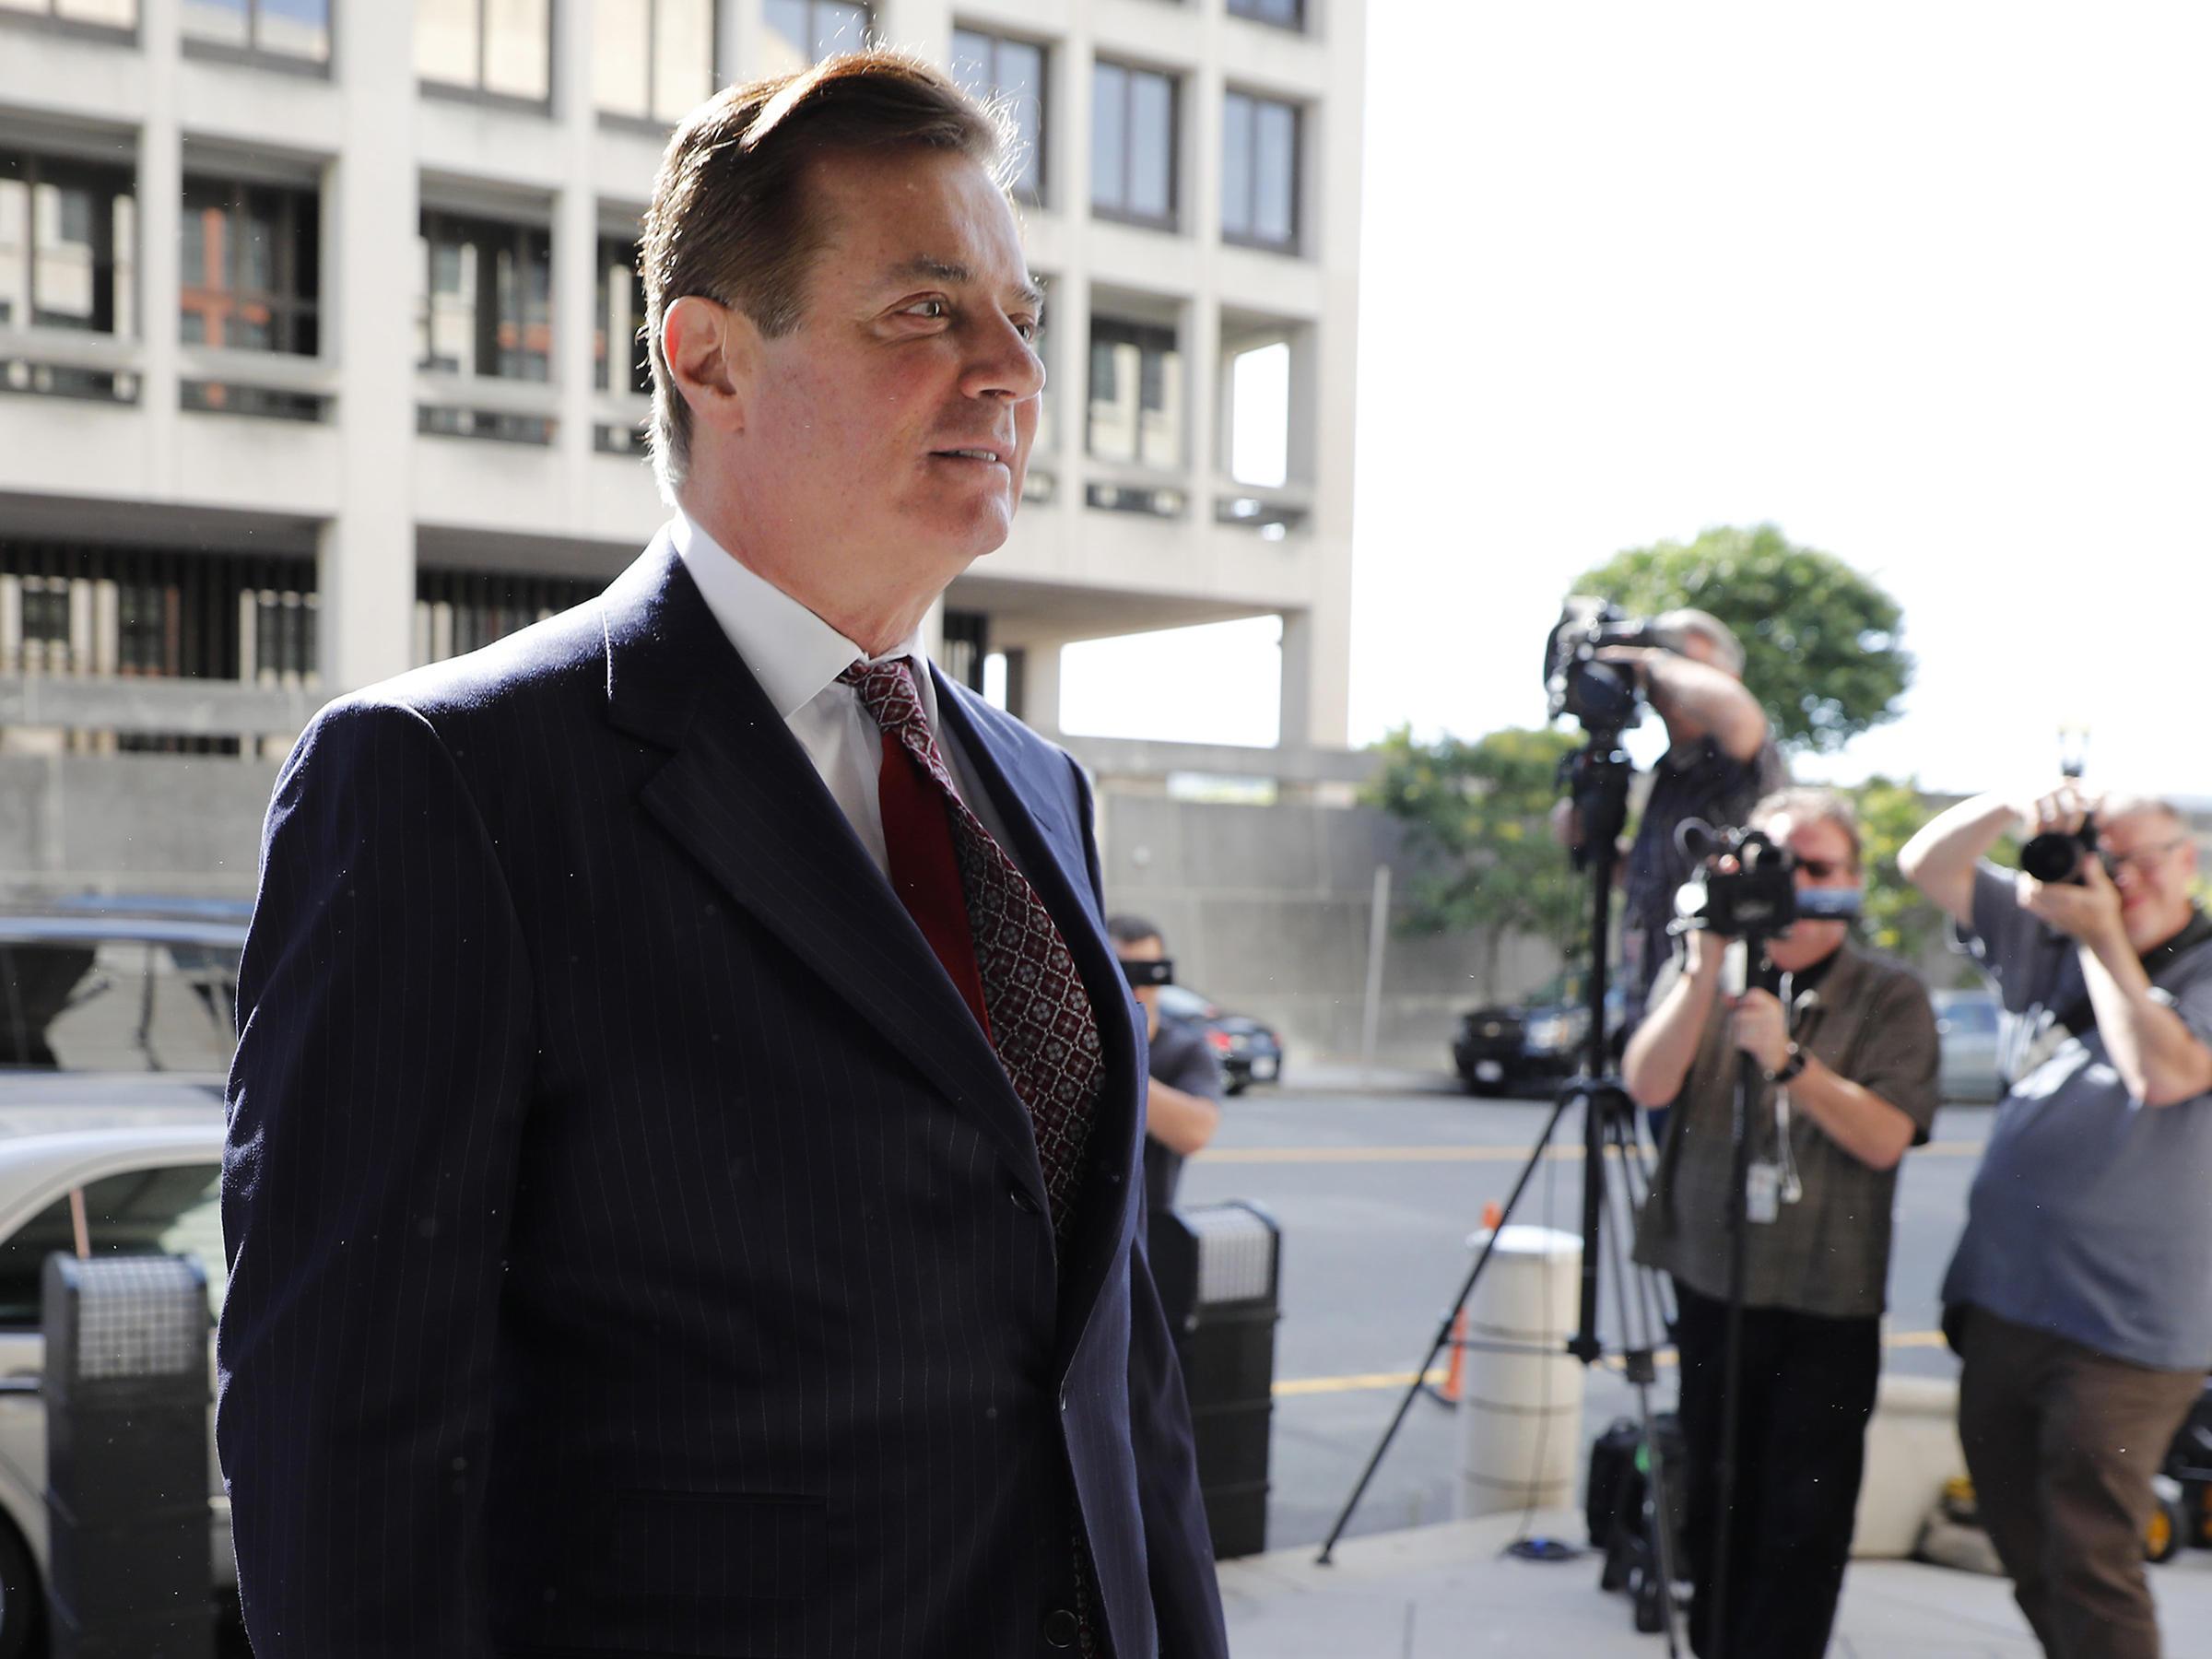 Court Filing: Manafort Asks Judge for Sentence Far Below the Maximum